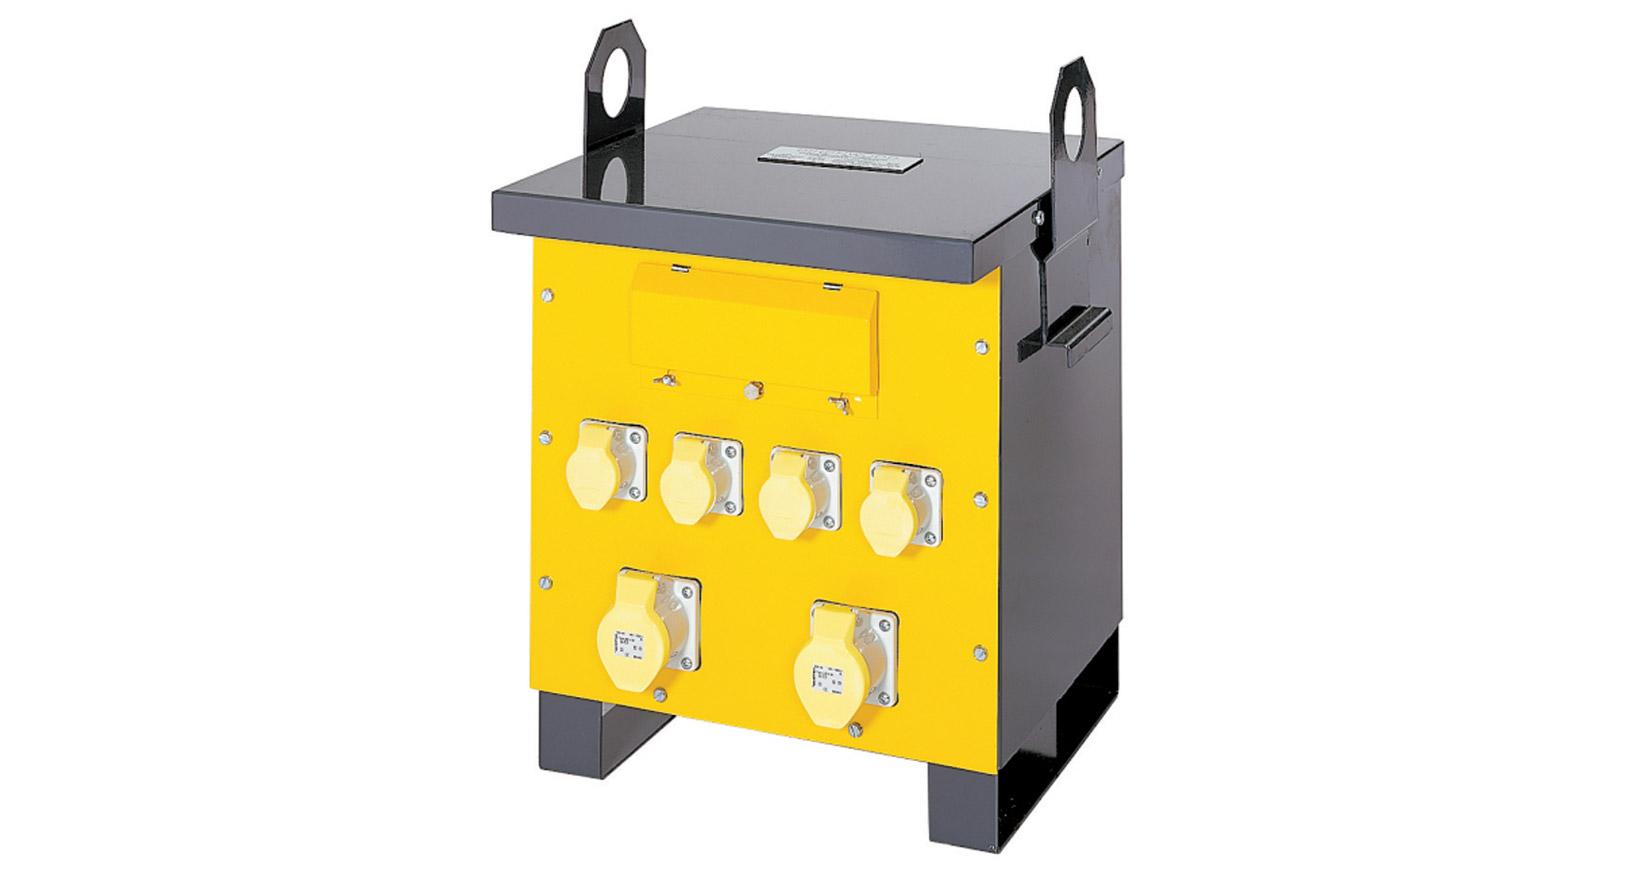 20 kVA 3 Phase Transformer